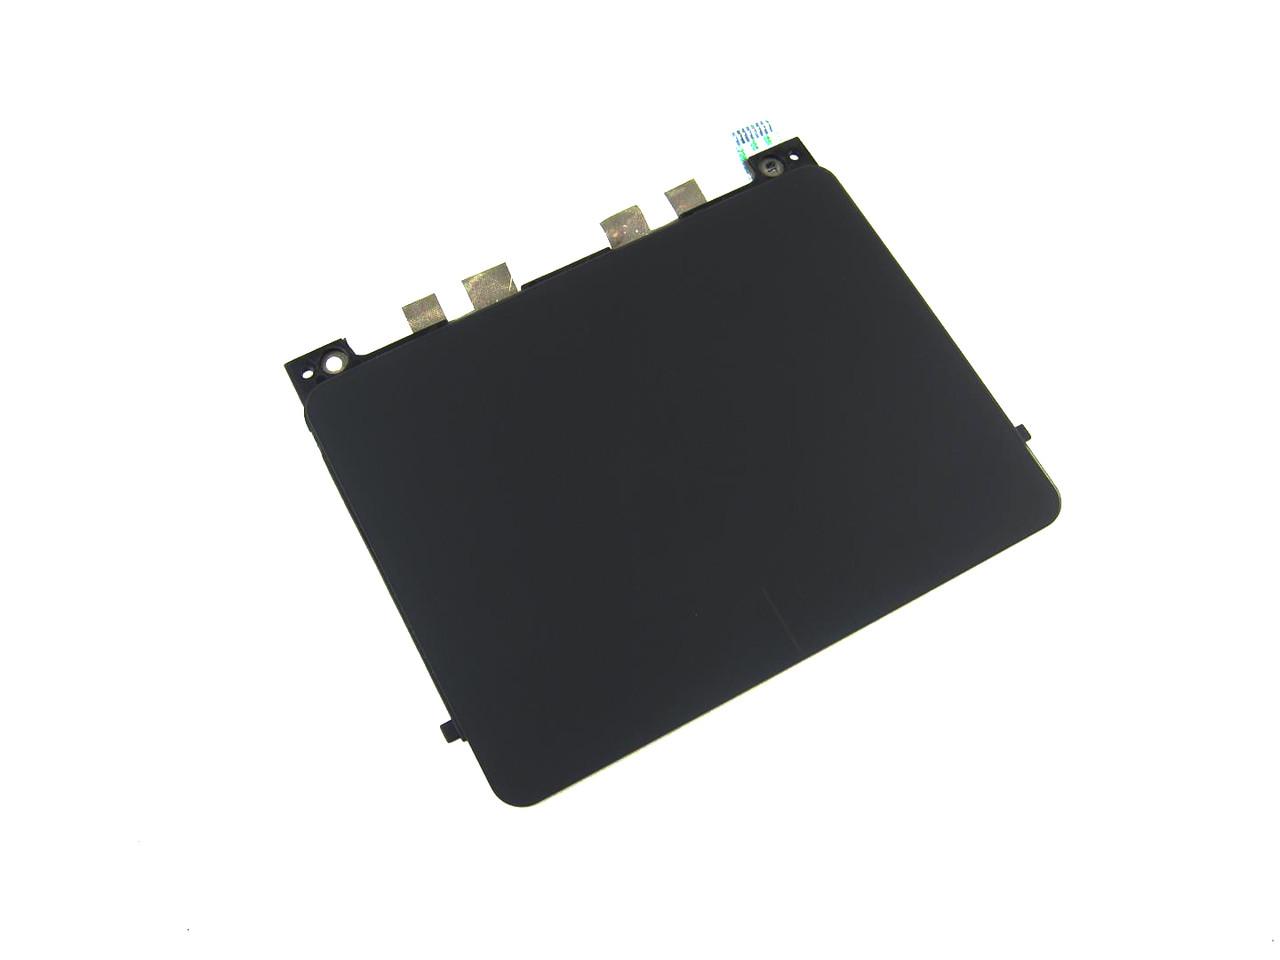 Dell XPS 15 9550 / Precision 15 5510 Touchpad Mouse Sensor - GJ46G